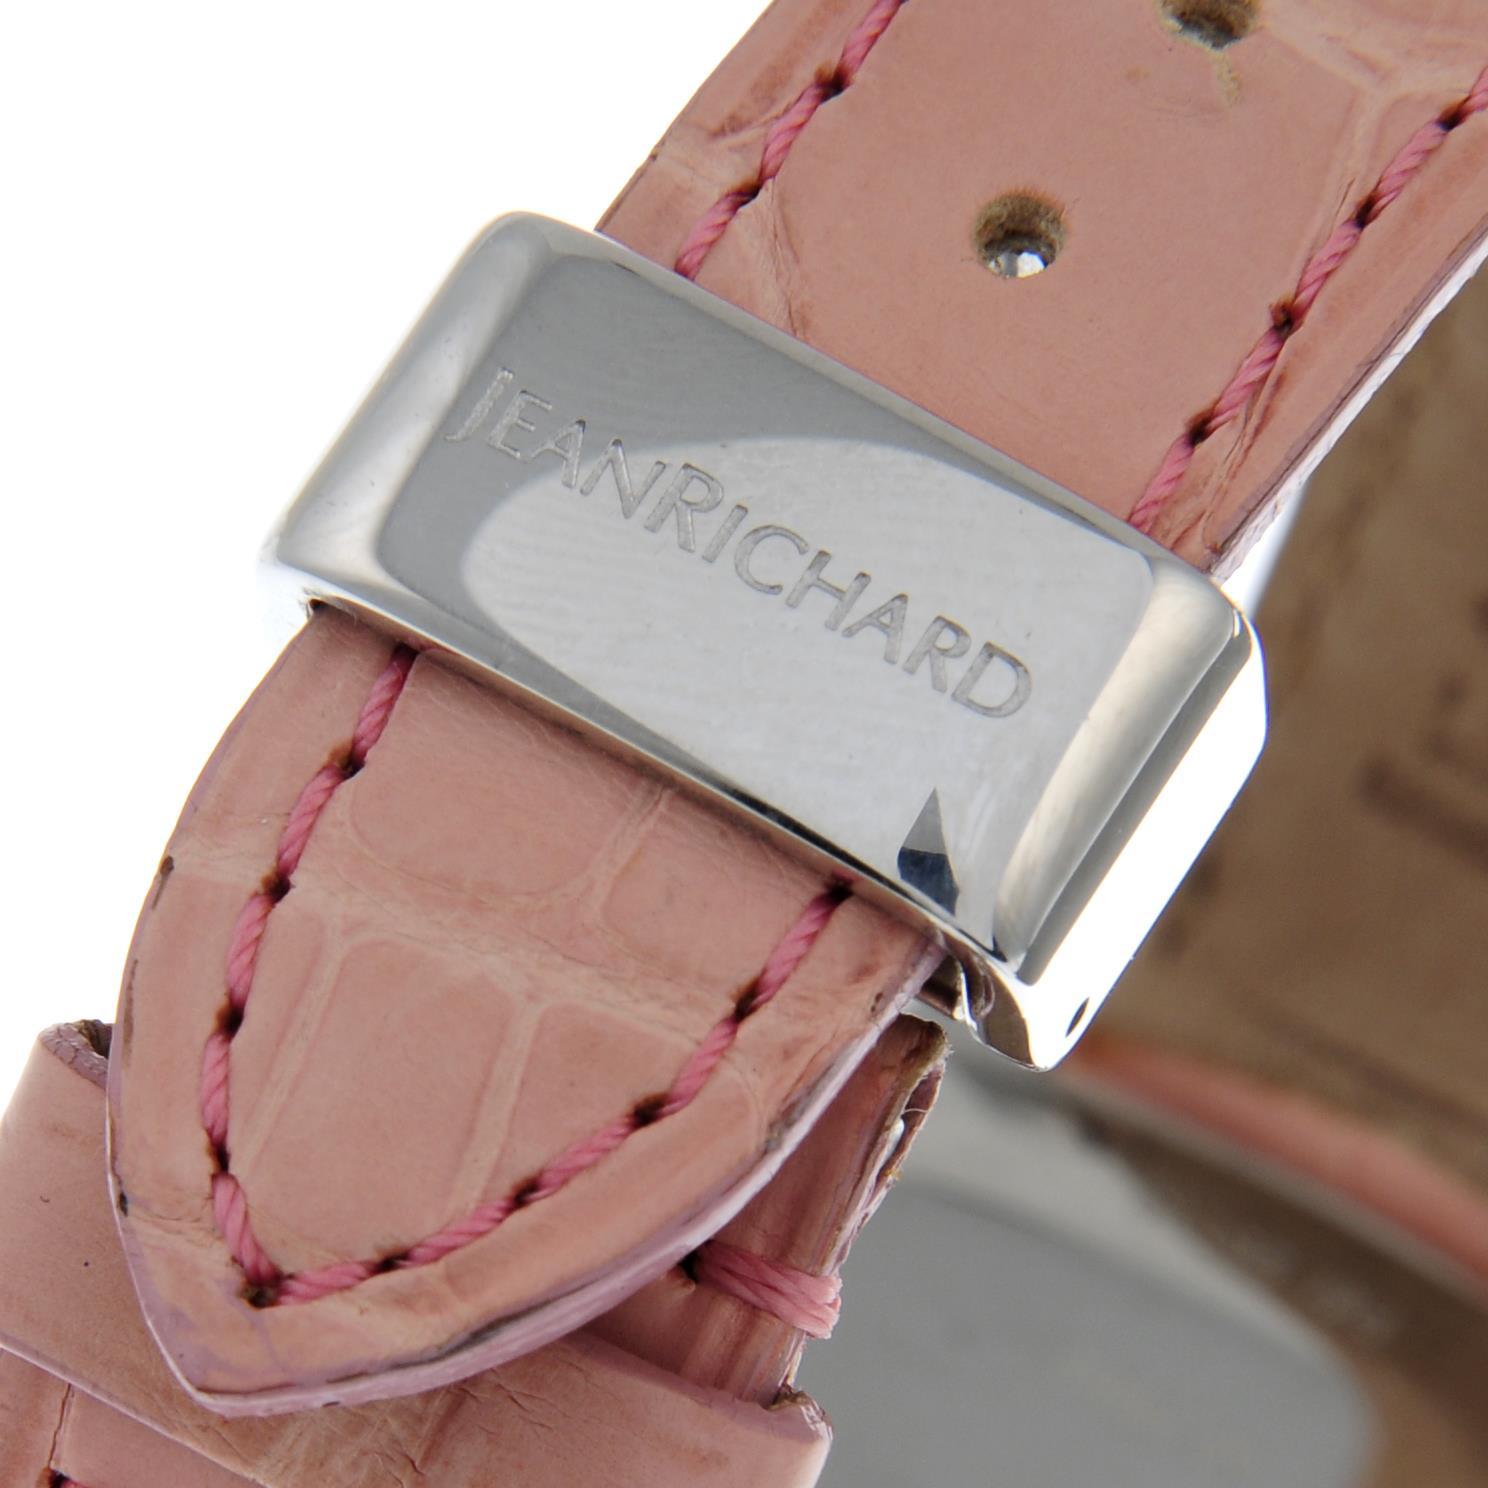 JEANRICHARD - a wrist watch. - Image 4 of 5